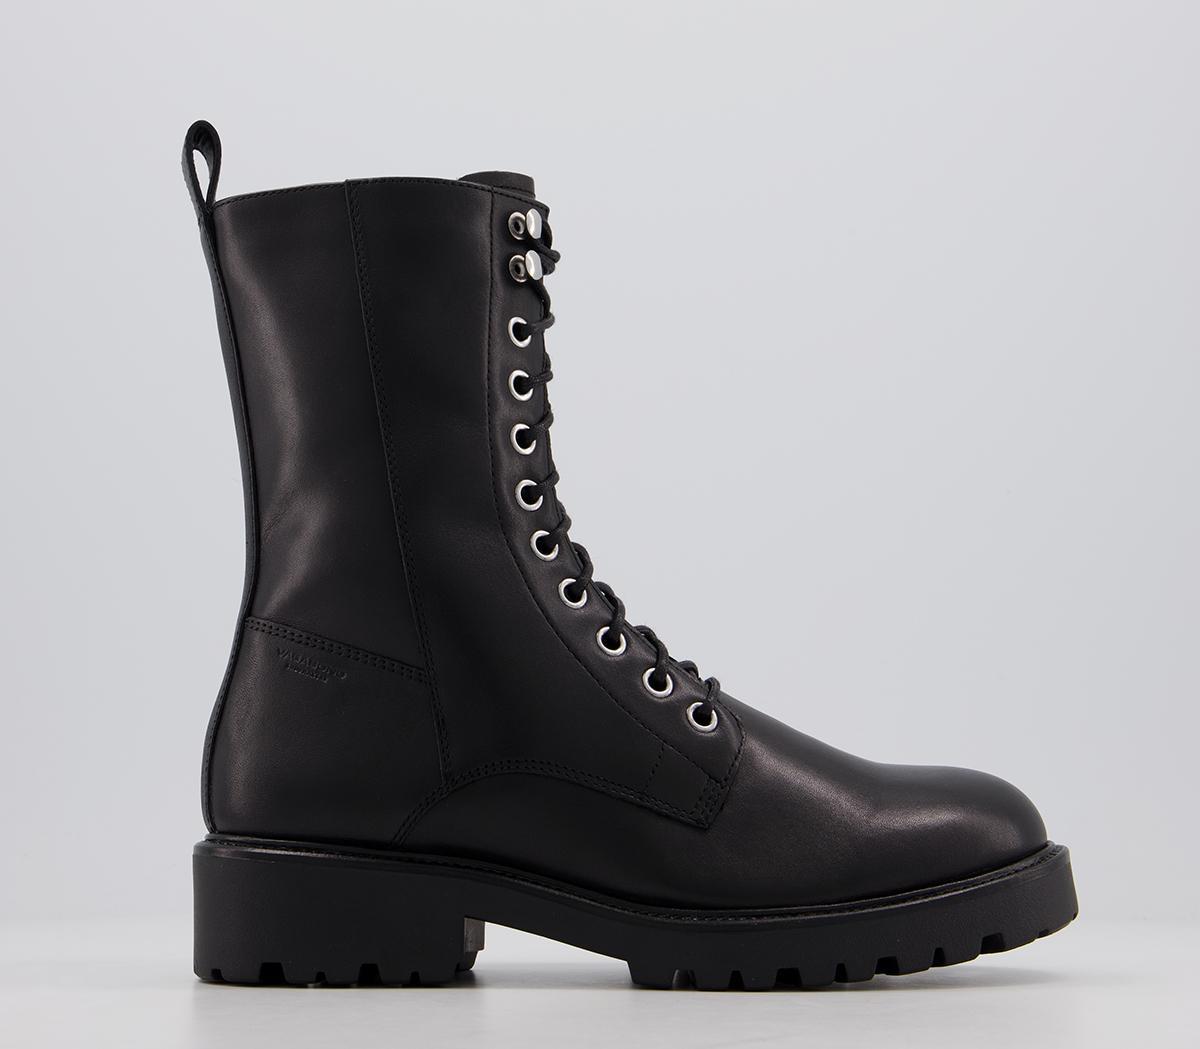 Vagabond Kenova High Lace Up Boots